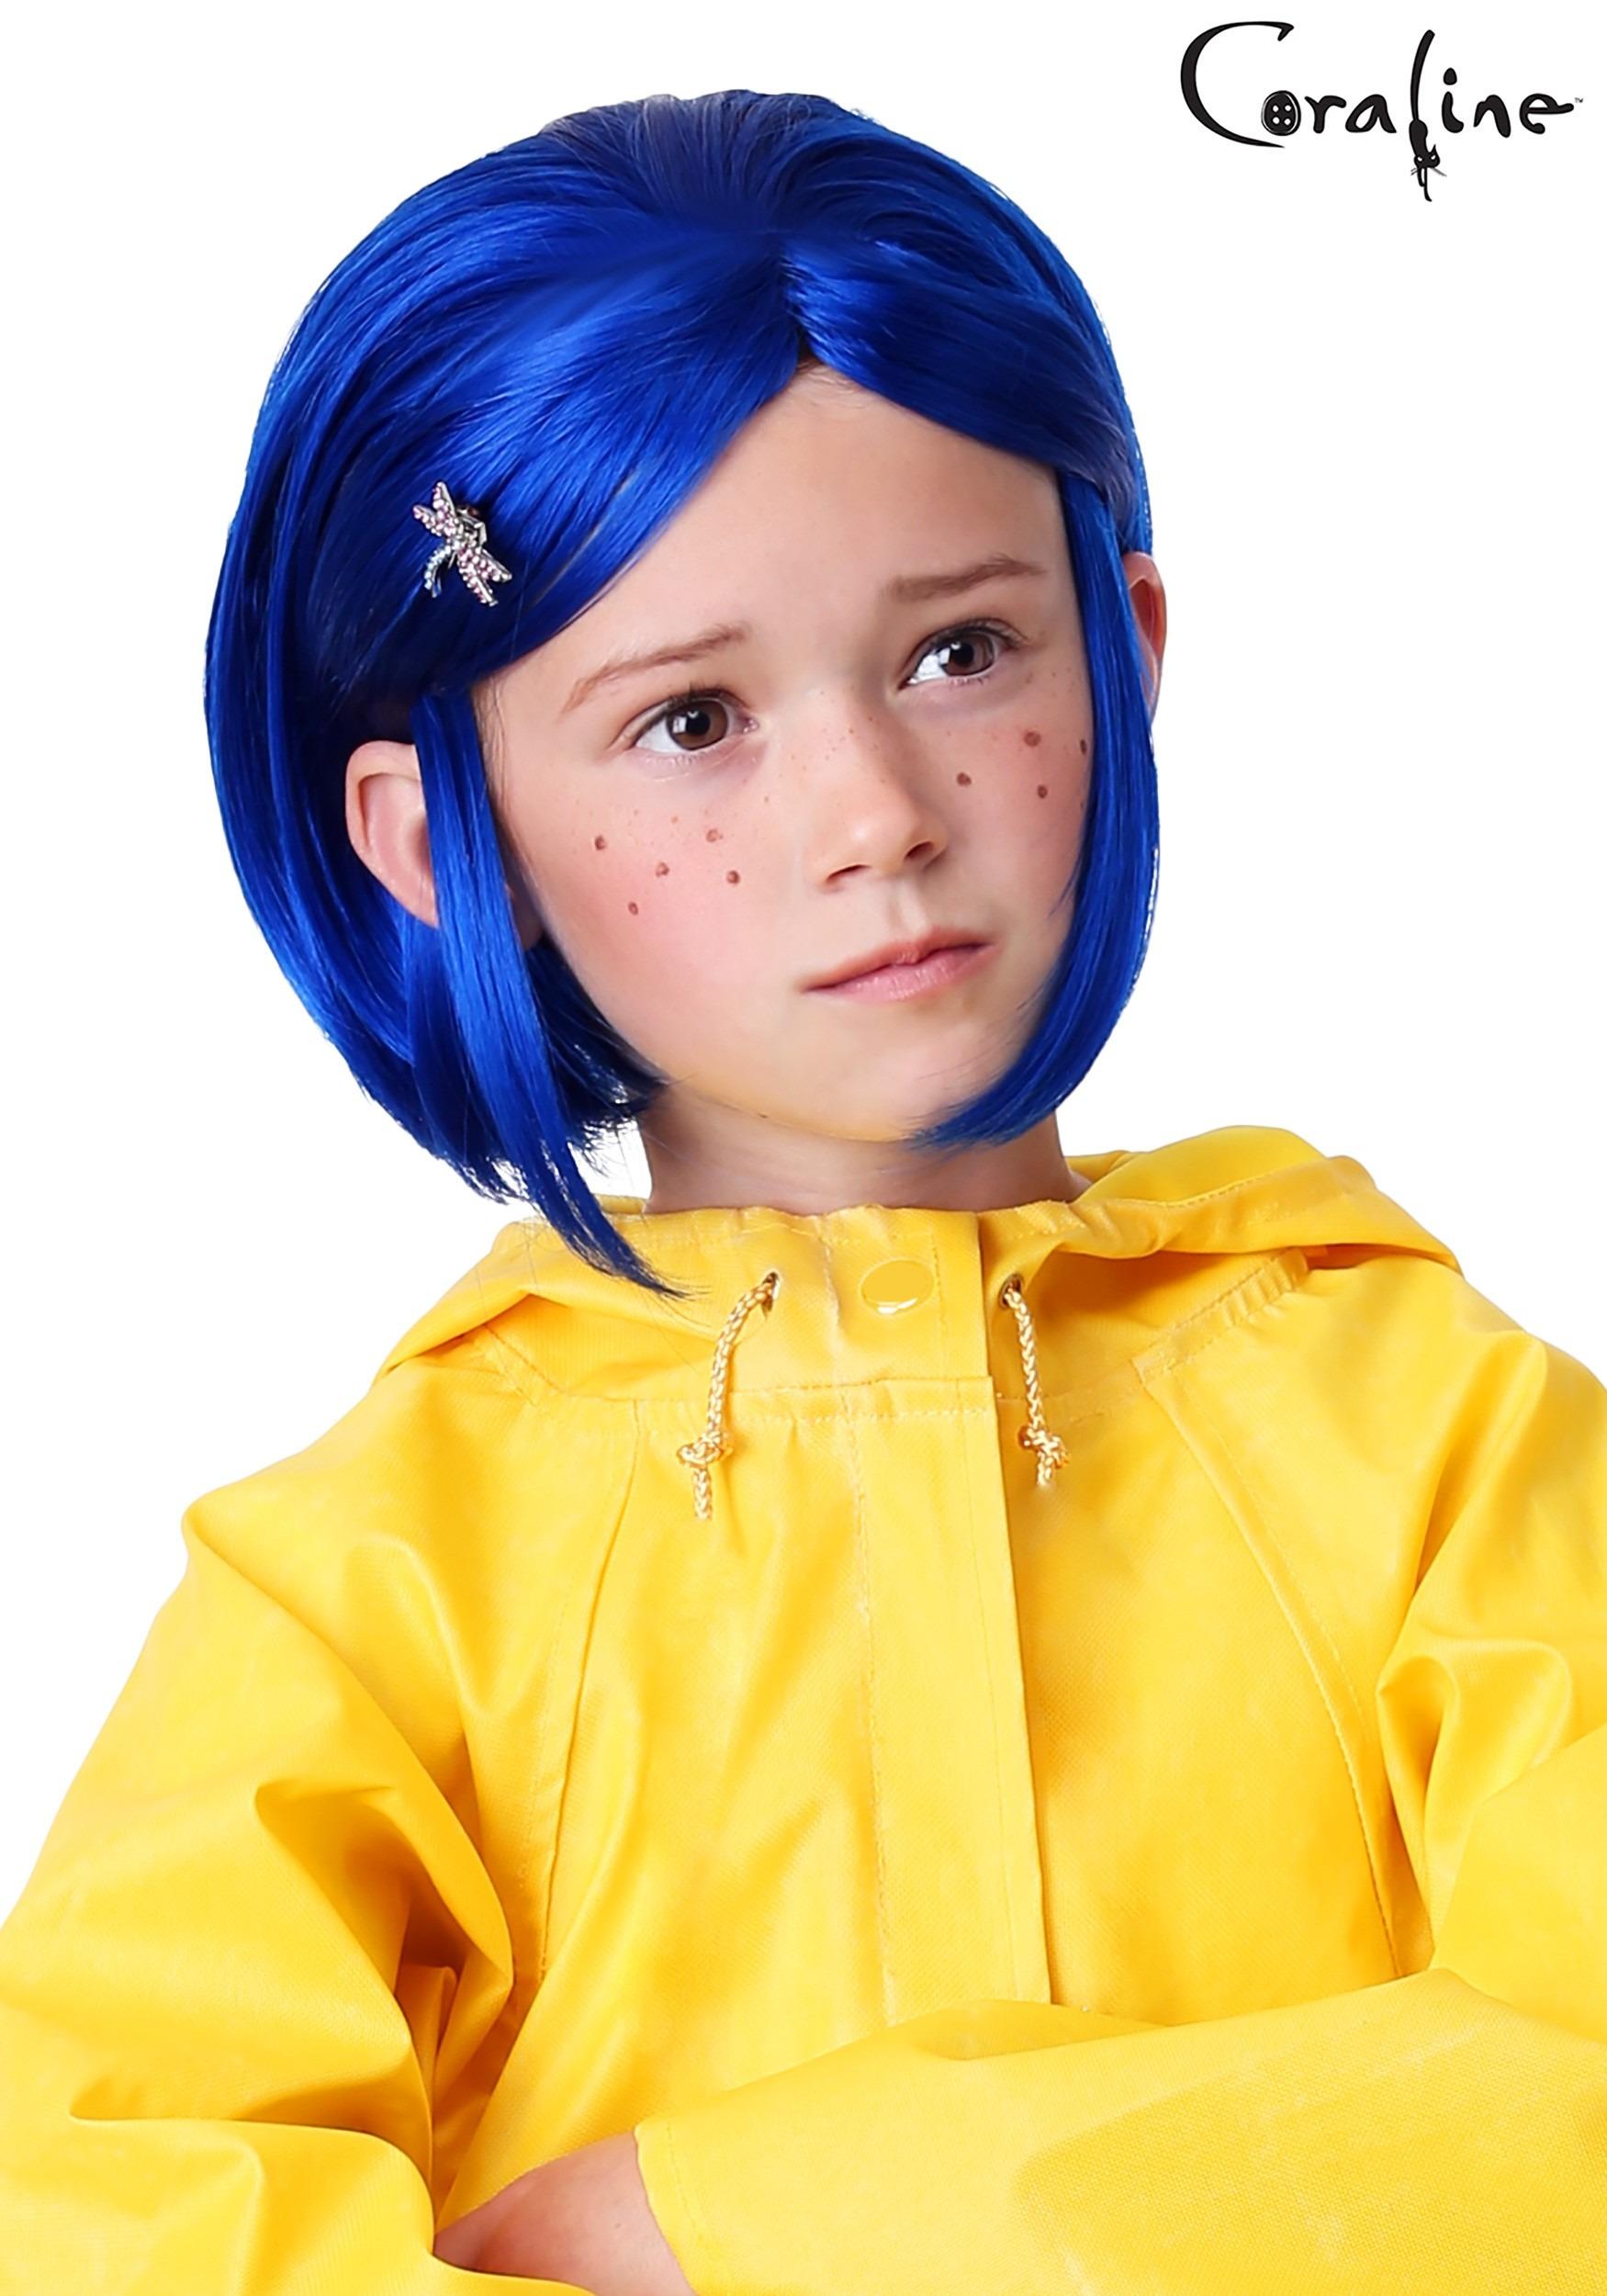 Girl S Coraline Wig